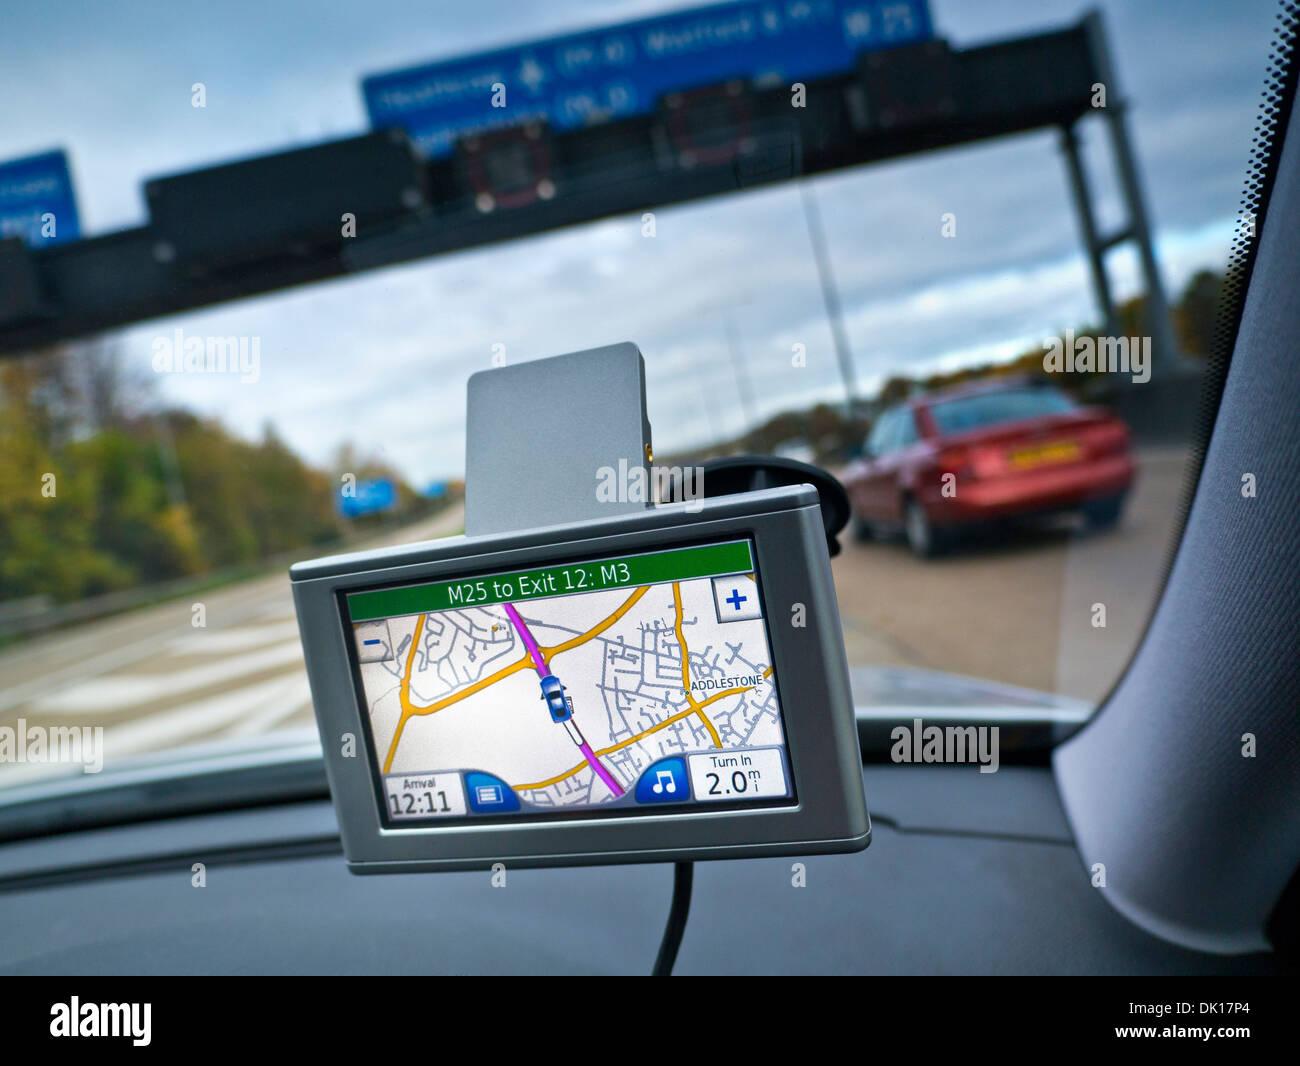 Satellite Navigation screen in-car display on M25 Orbital motorway Surrey UK - Stock Image